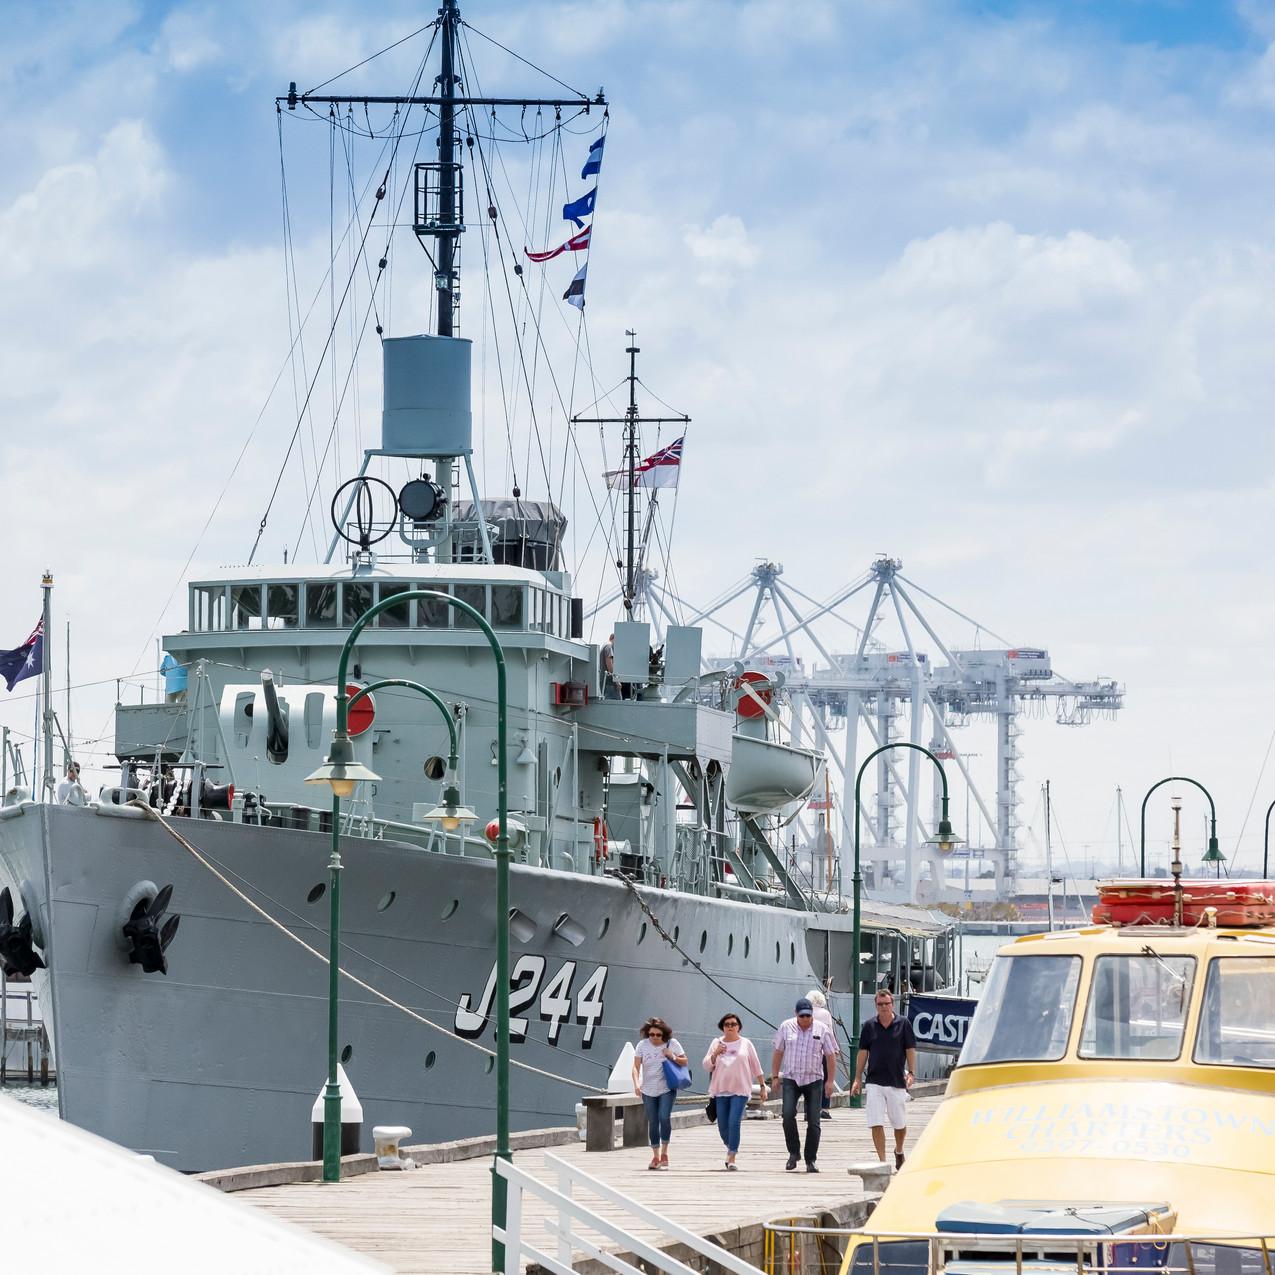 HMAS Castlemaine at Williamstown